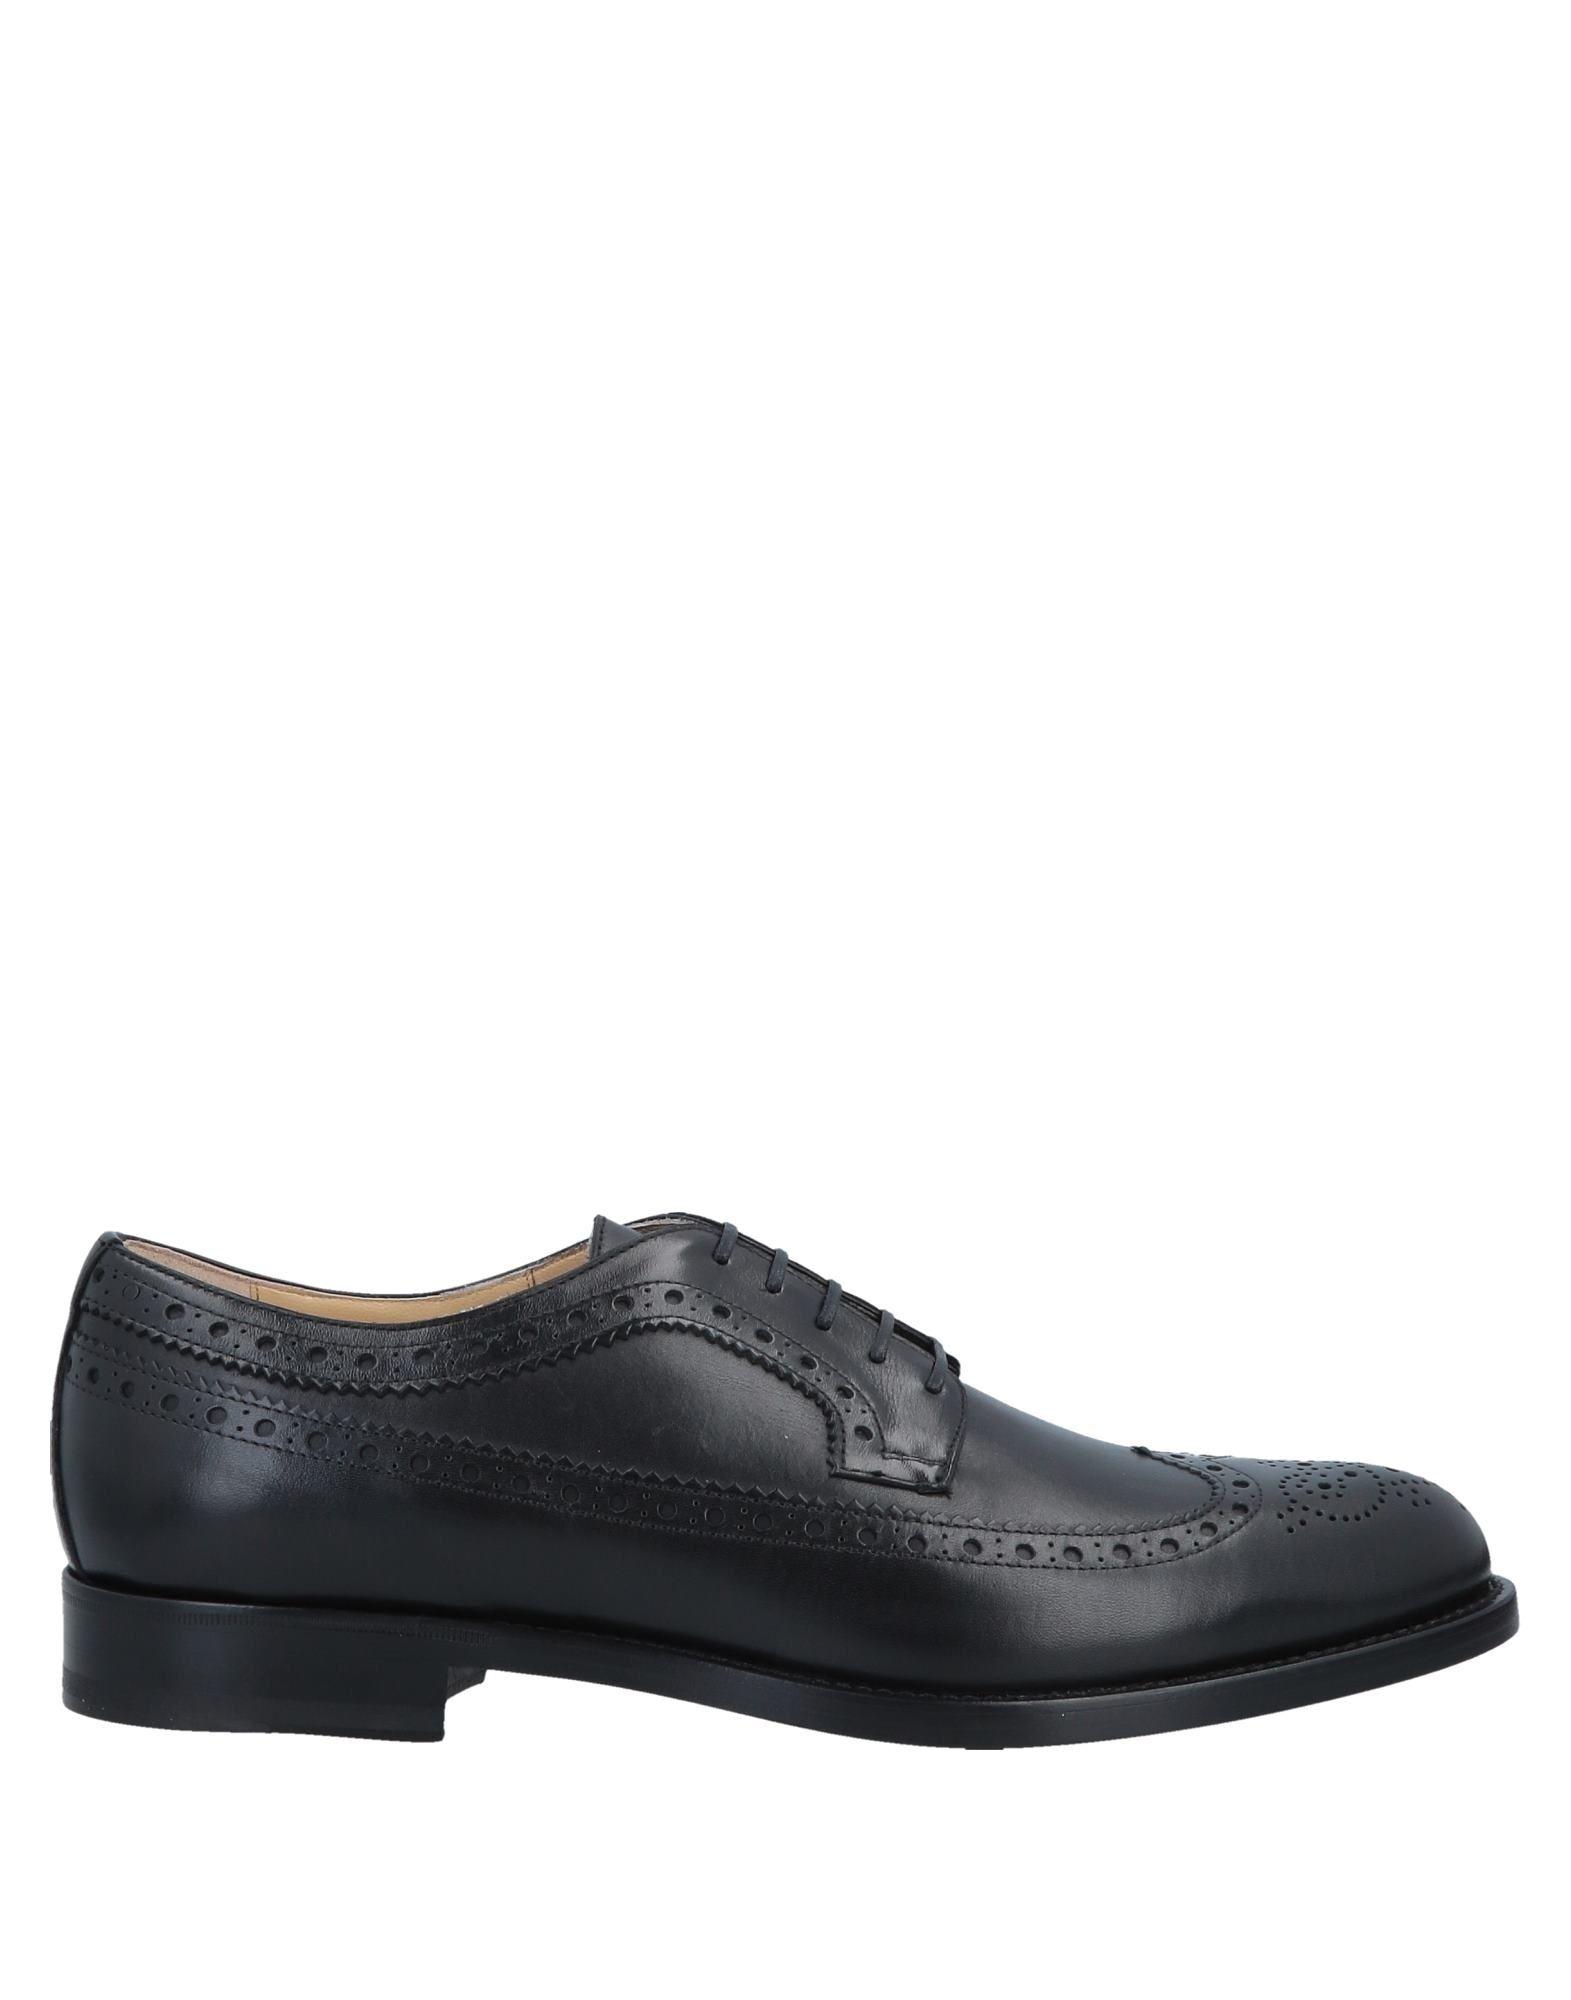 Фото - PELUSO NAPOLI Обувь на шнурках обувь на высокой платформе dkny